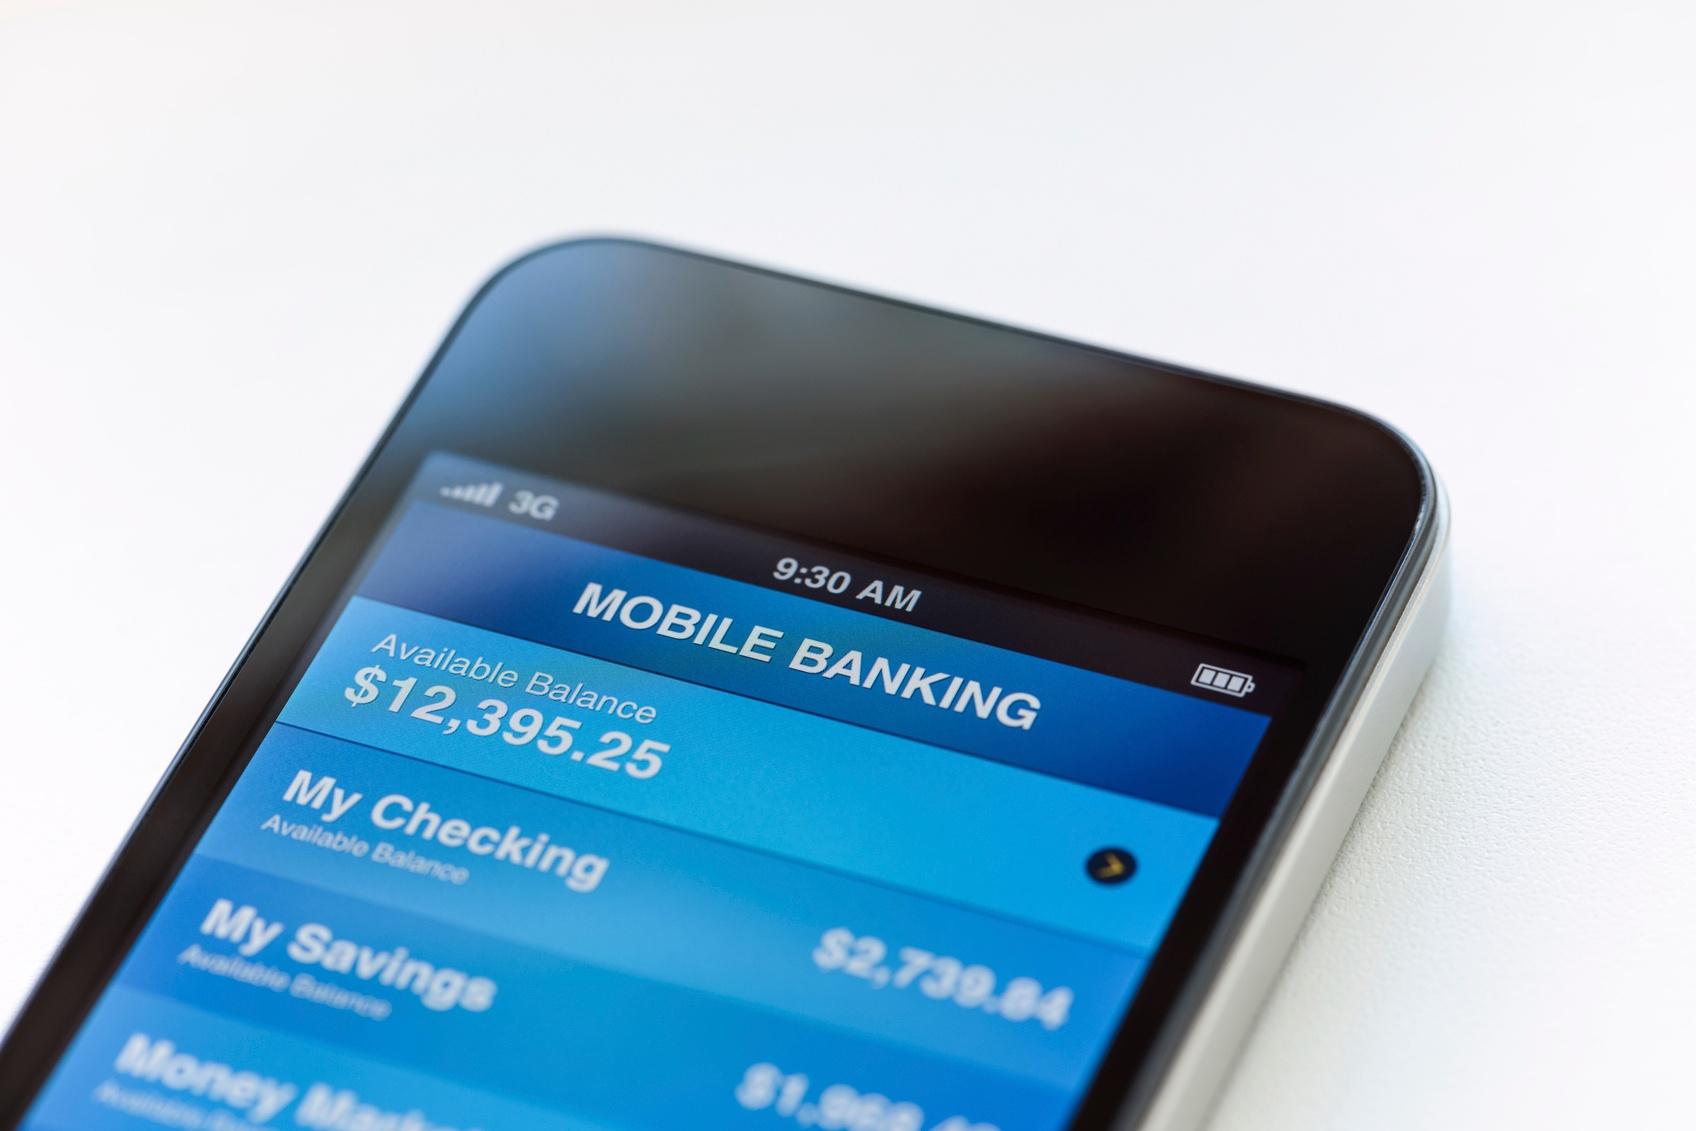 Mobile-banking-on-phone-000021306348_Medium.jpg